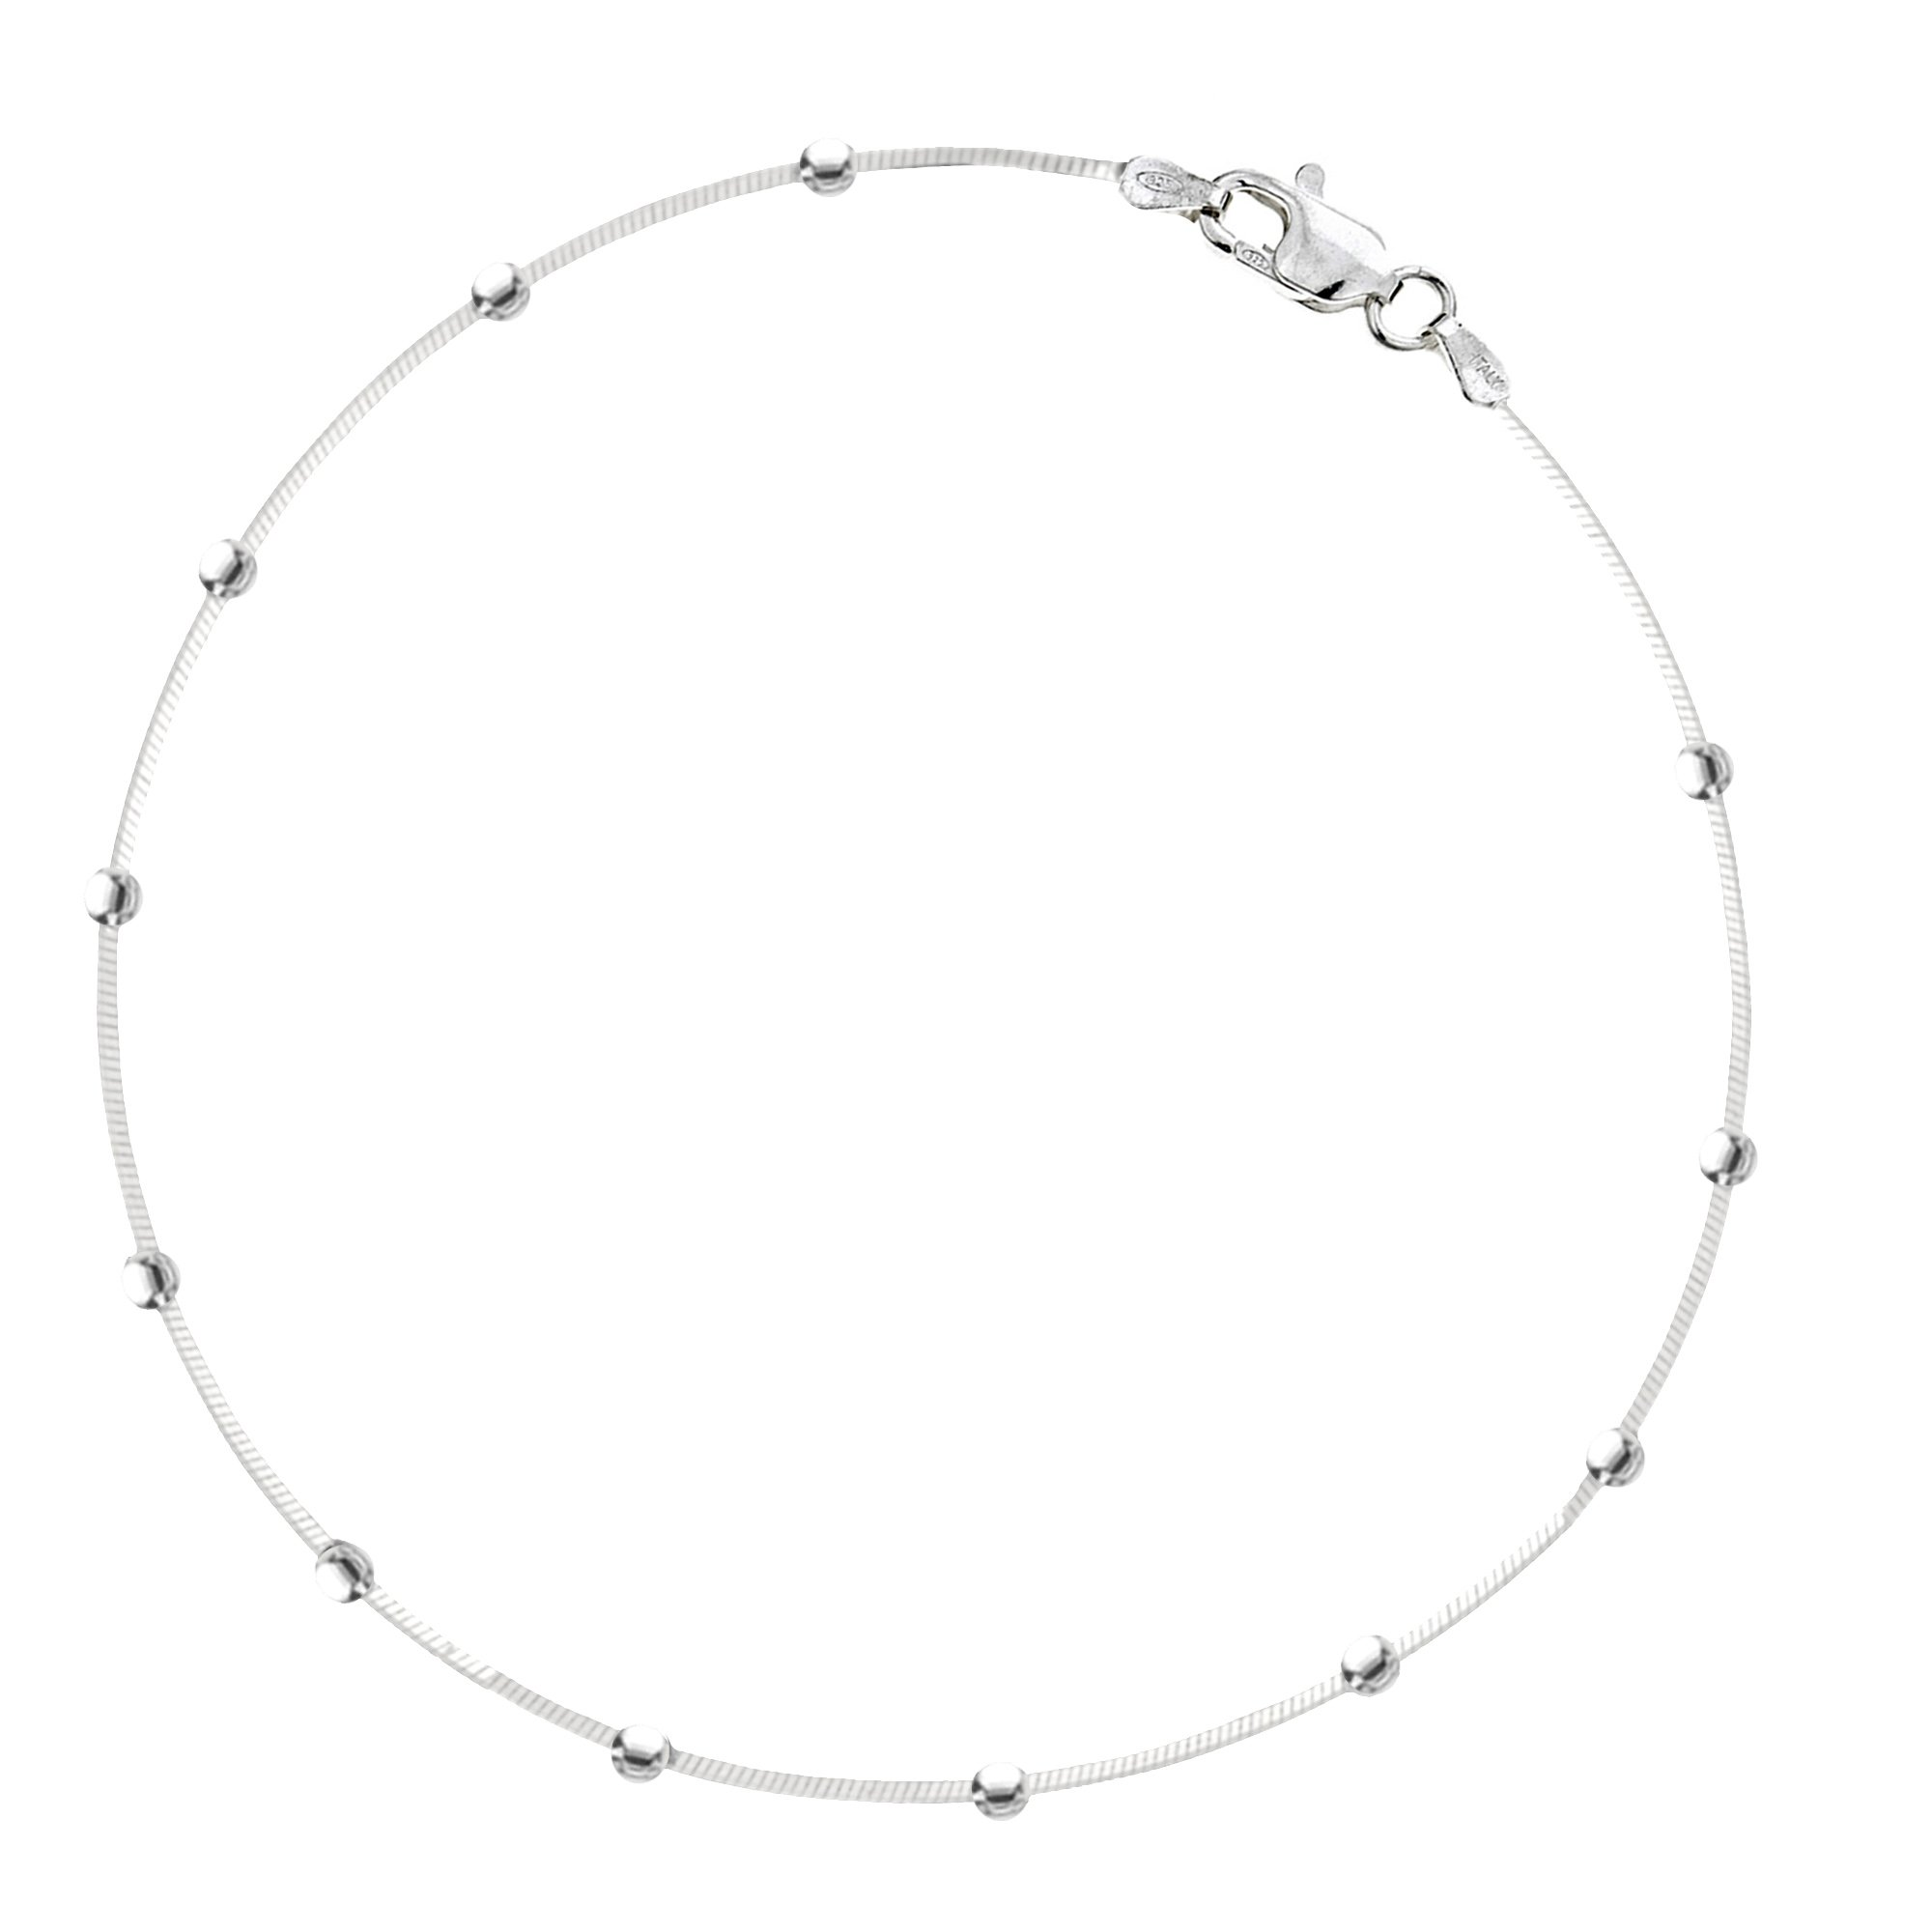 Sterling Silver Snake Bead Italian Foot Chain Anklet Ankle Bracelet